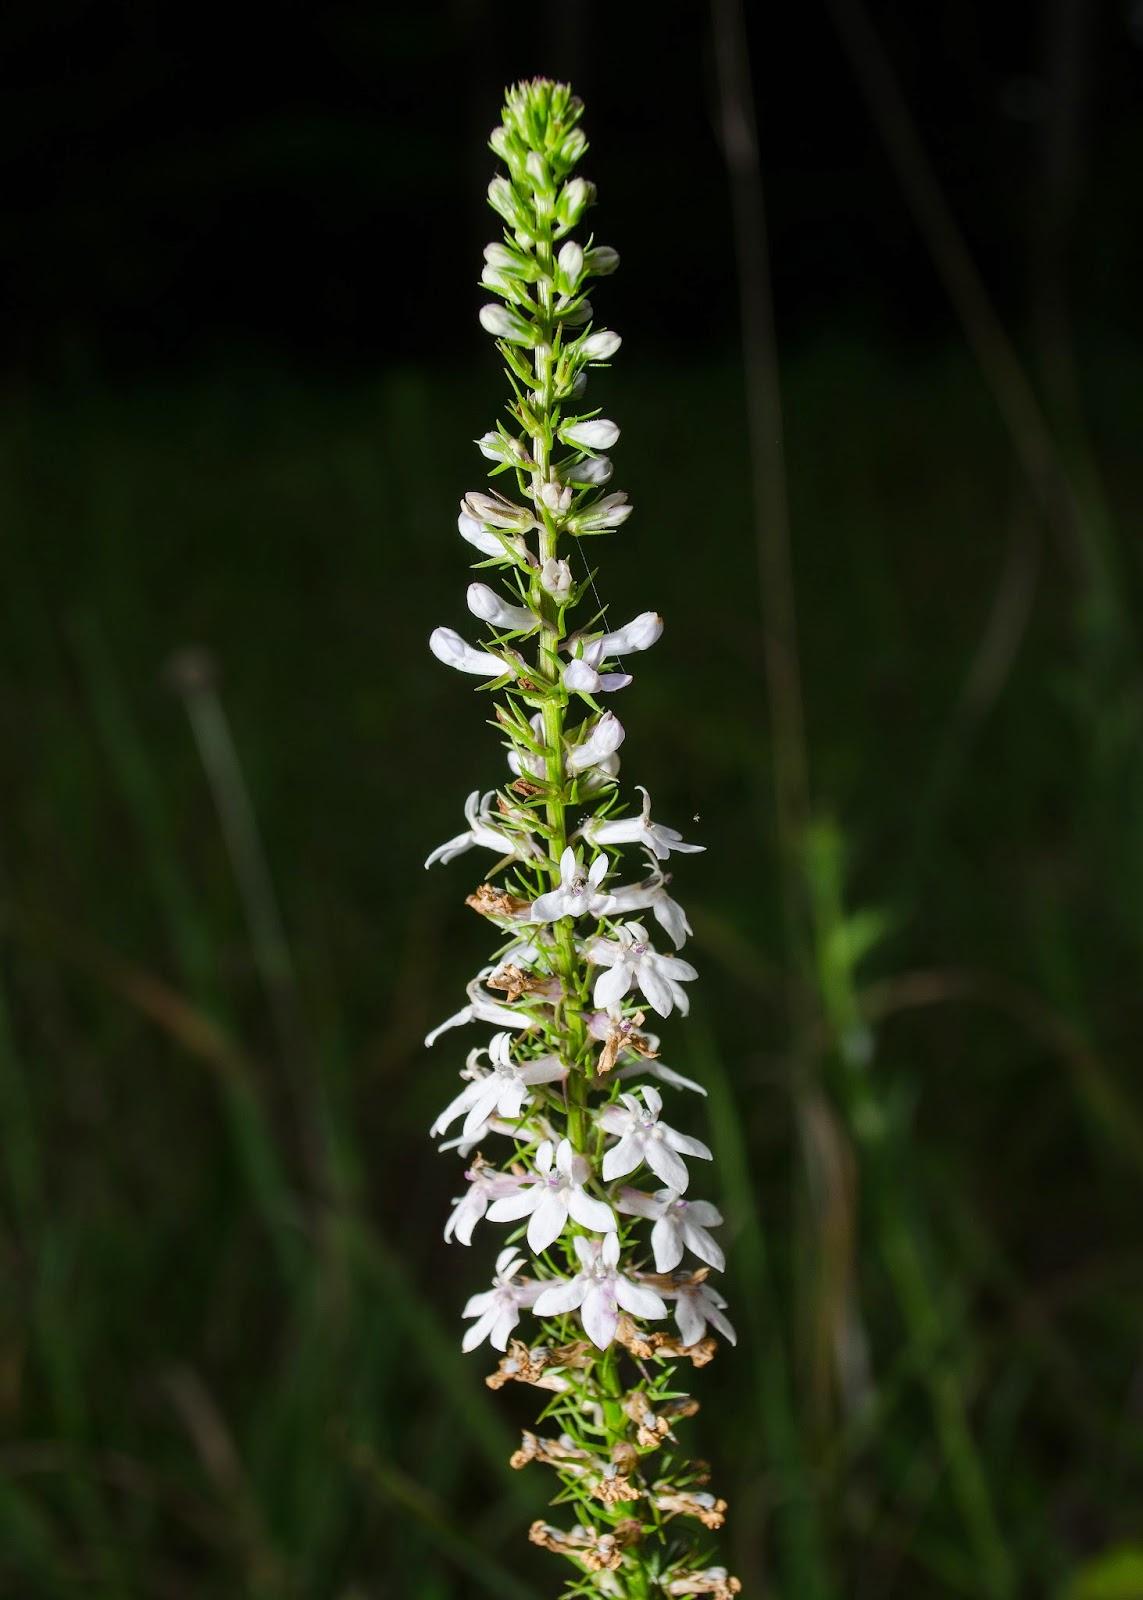 Pale-Spiked Lobelia, Lobelia spicata